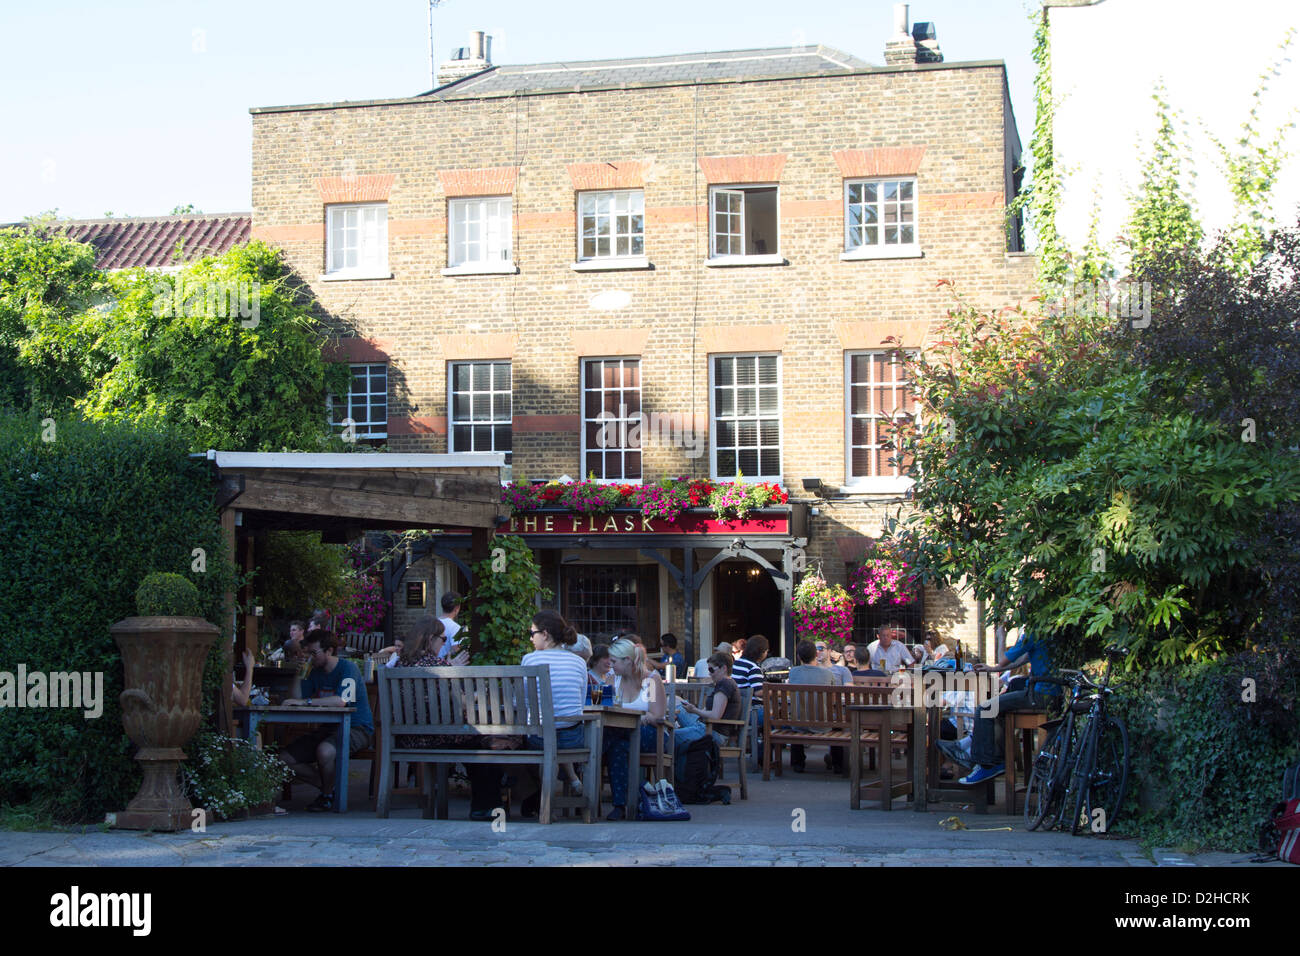 The Flask Pub - Highgate Village - London - Stock Image